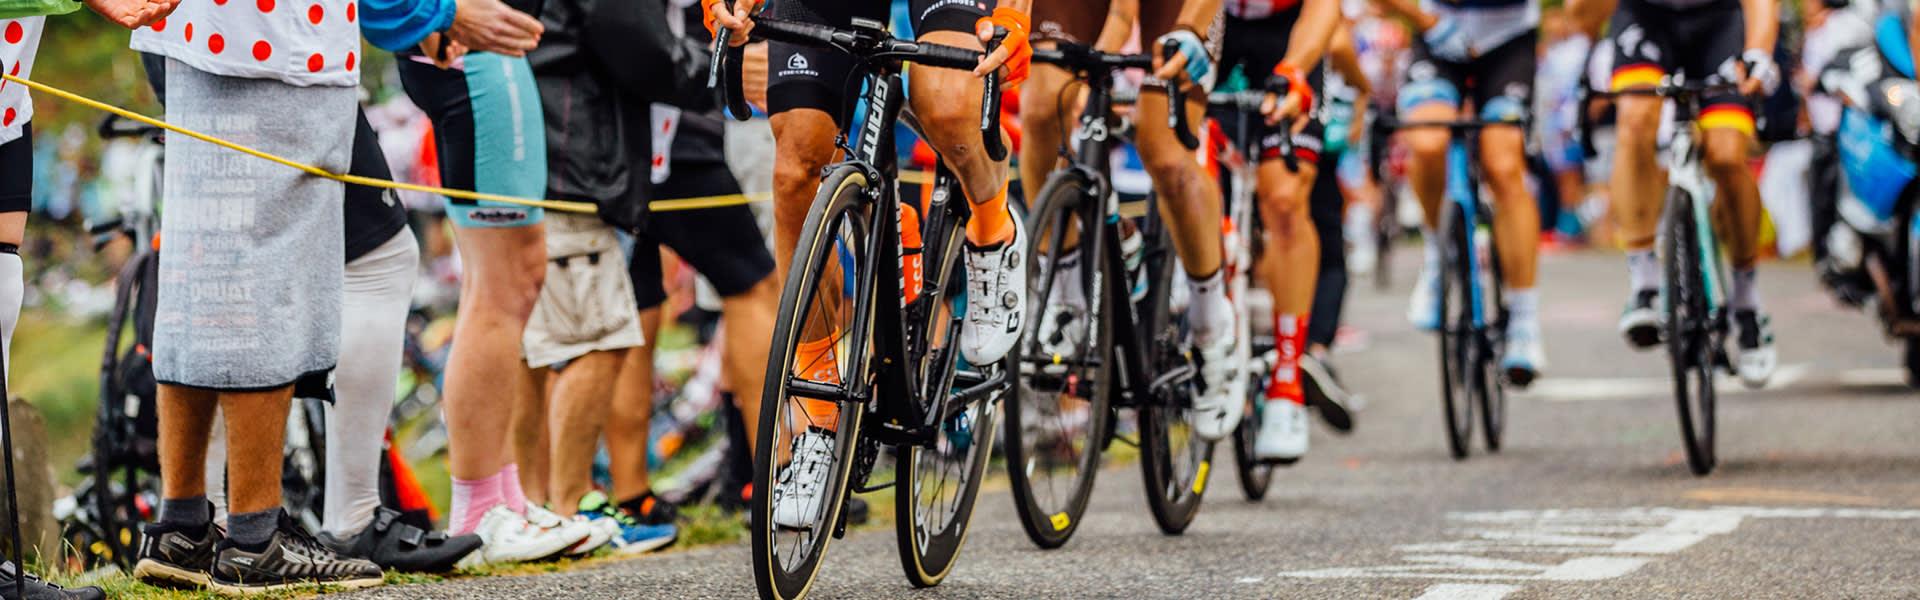 Performance & Racing Road Bikes